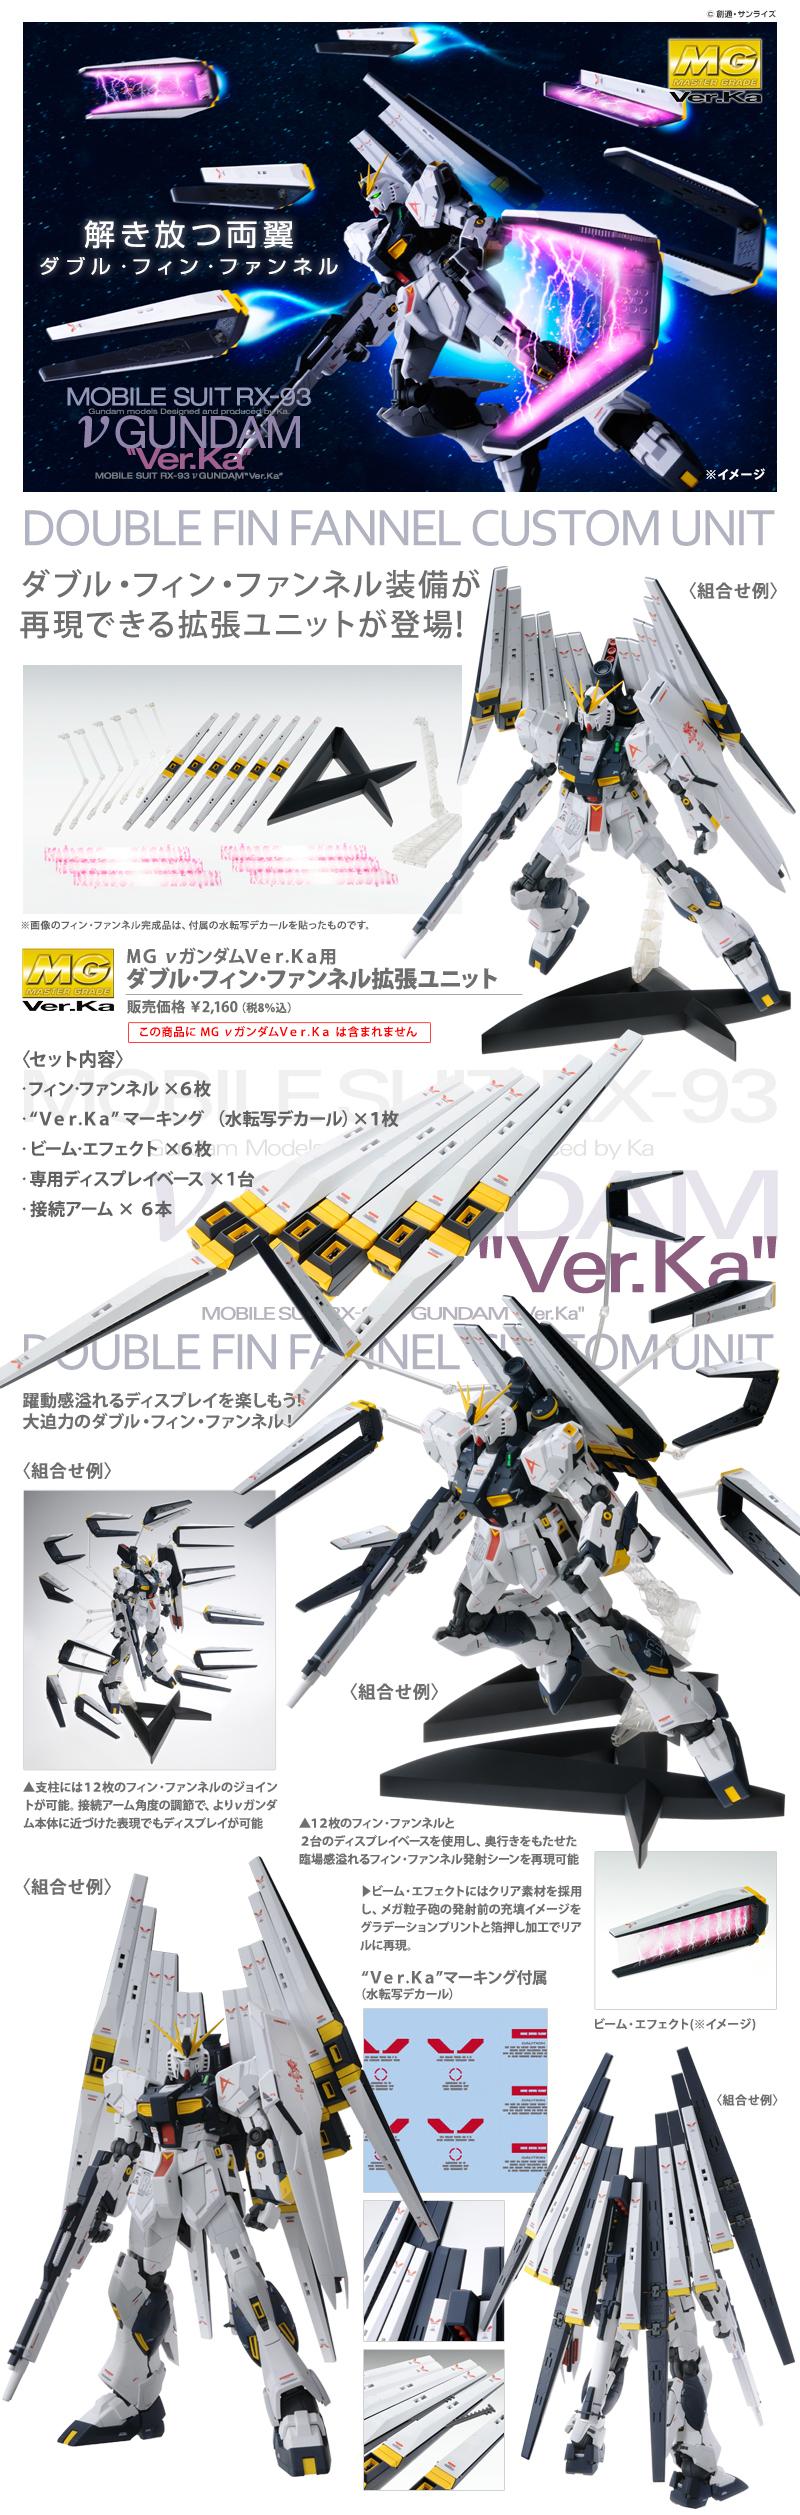 MG 1/100 RX-93 ダブル・フィン・ファンネル拡張ユニット 公式商品説明(画像)